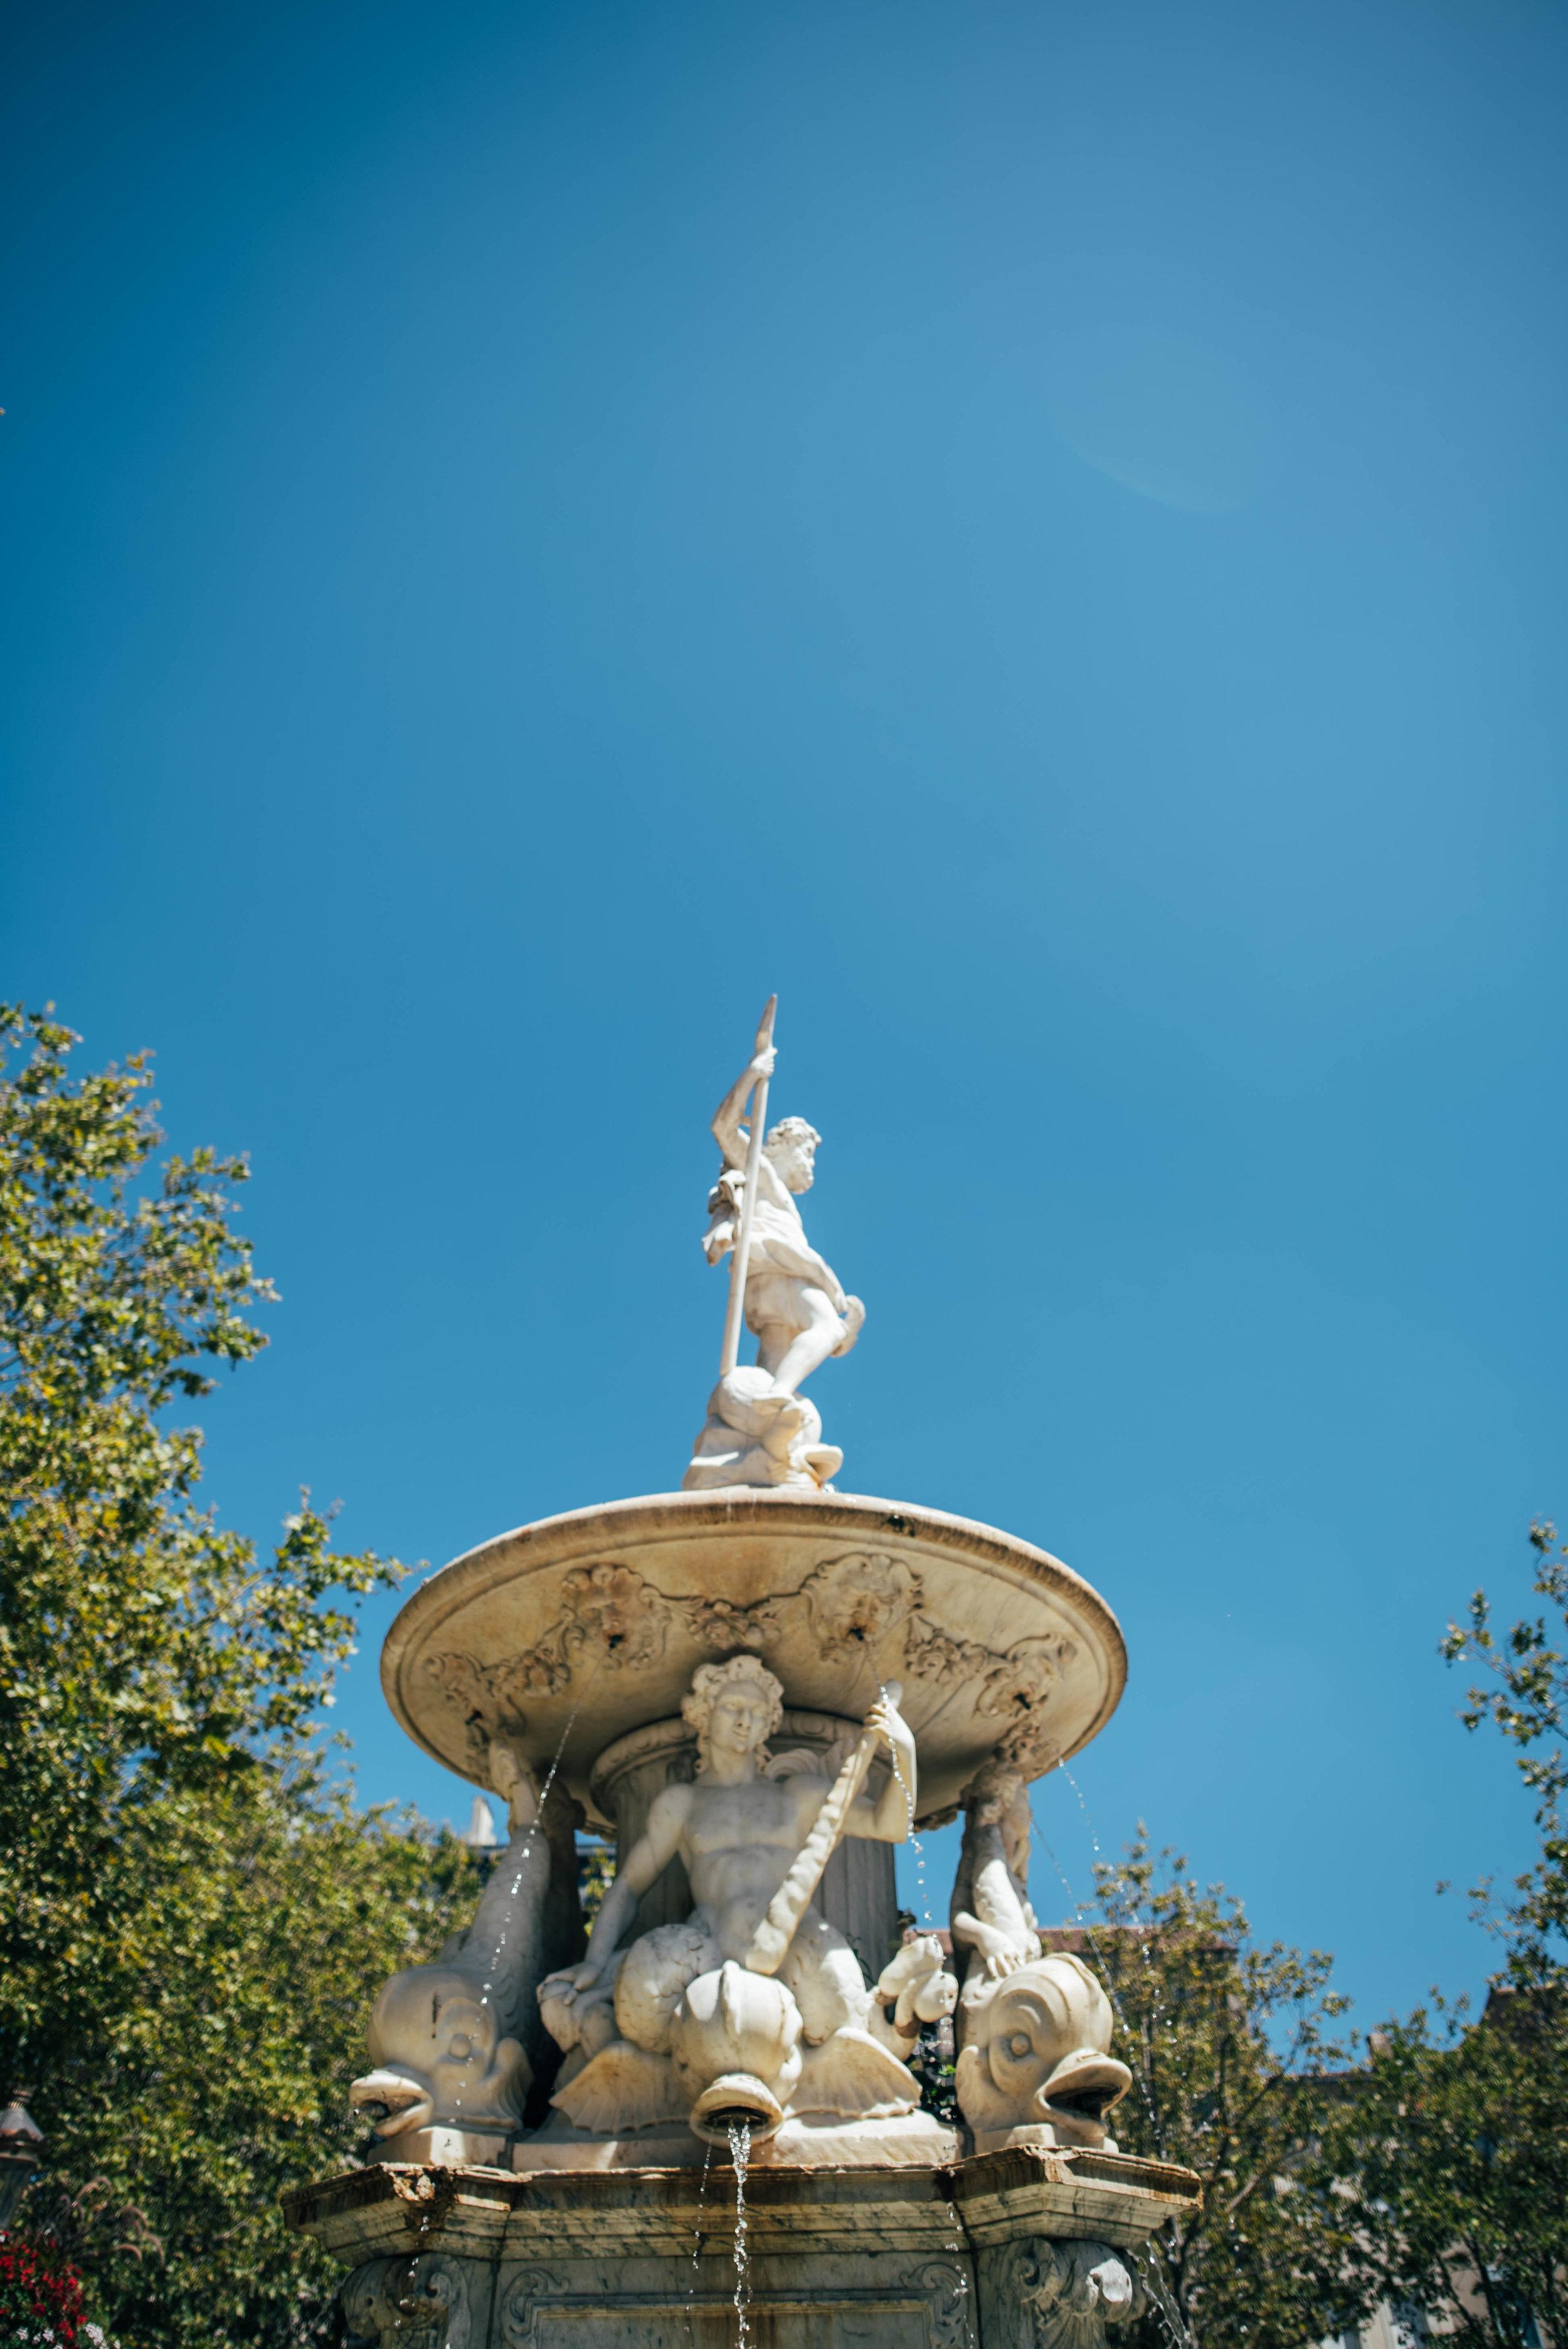 La Fontaine de Neptune Carcassonne France Essex UK Documentary Photographer